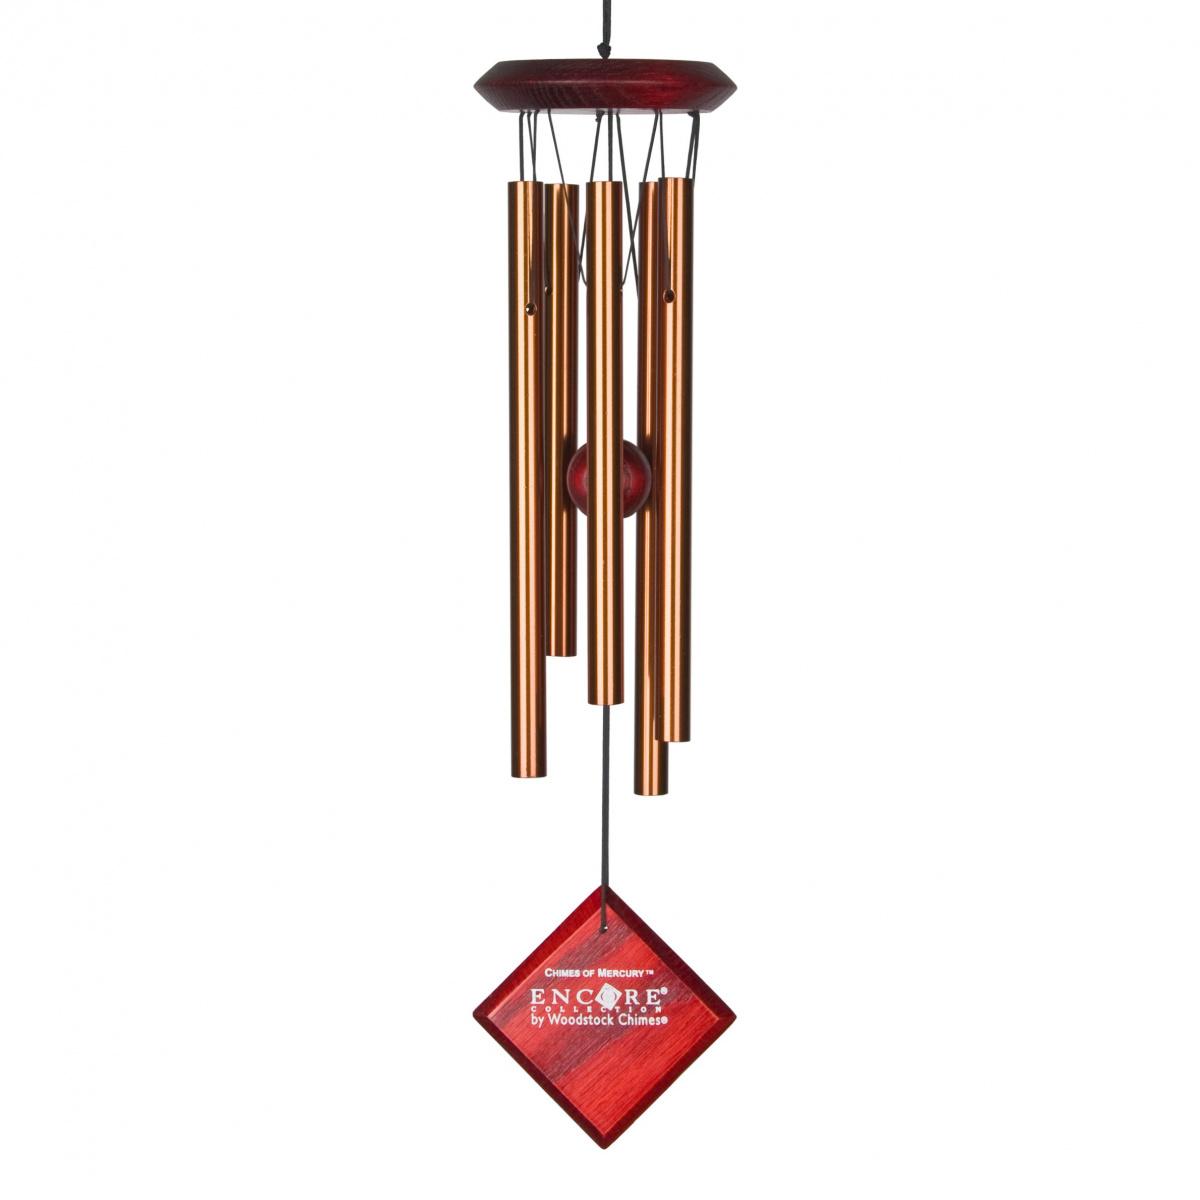 Woodstock vindspil, 35 cm - Merkur, bronze